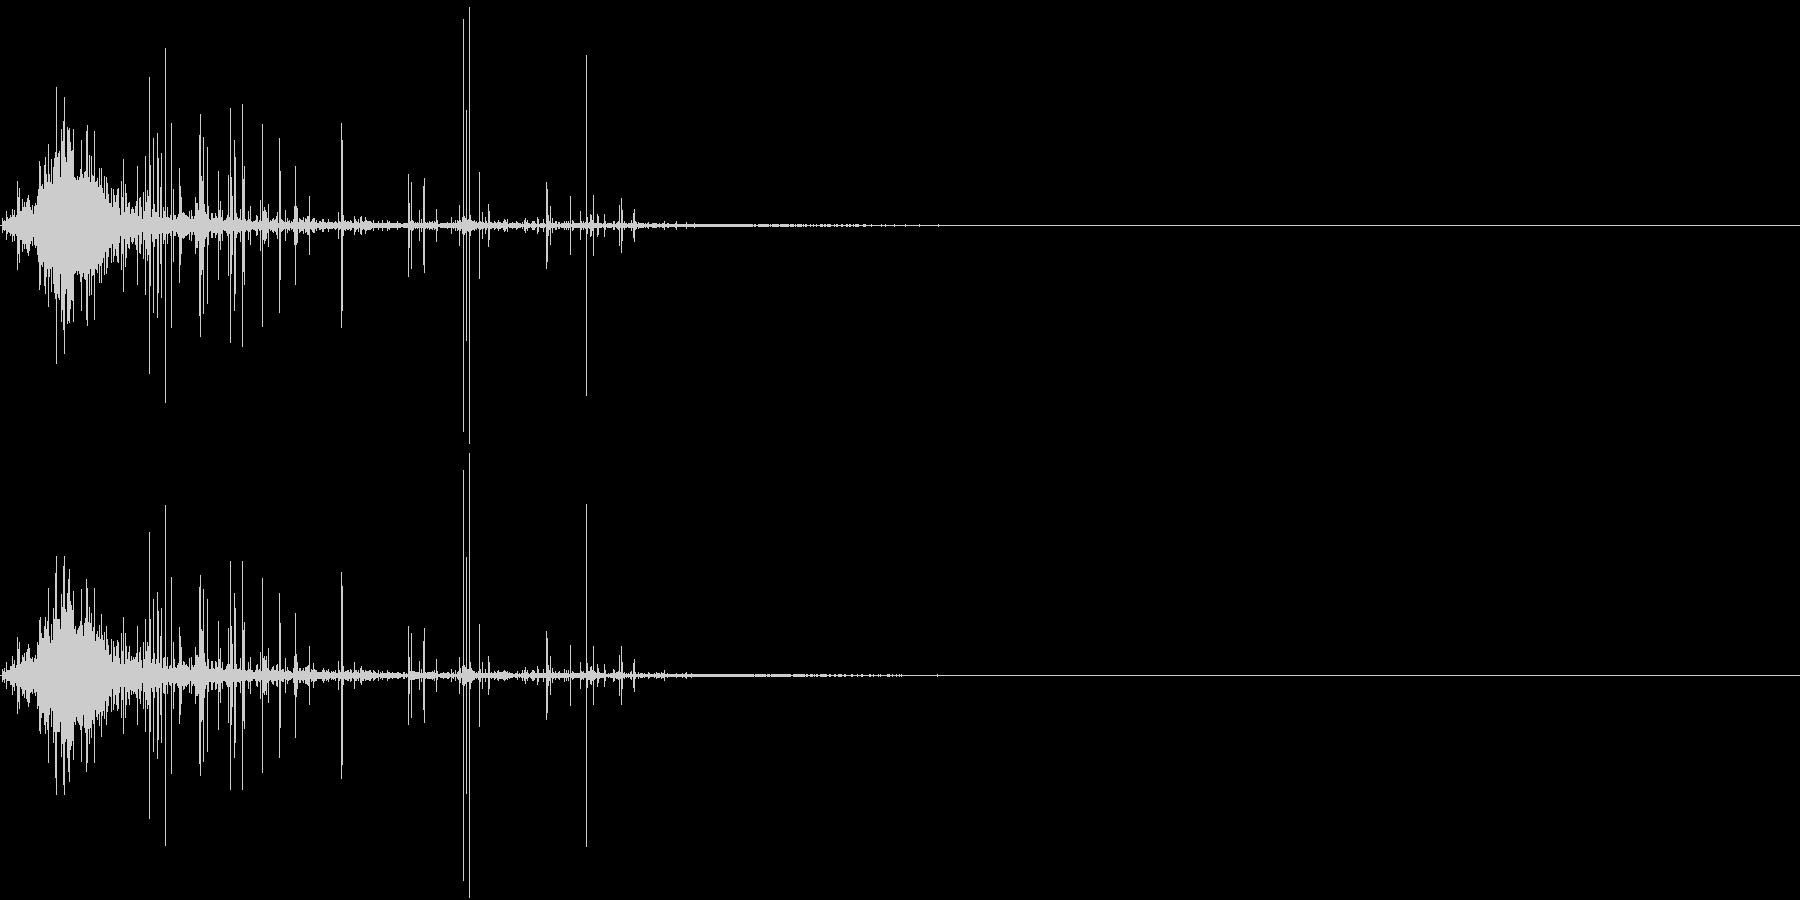 Zombie ゾンビの噛み付き音 3の未再生の波形